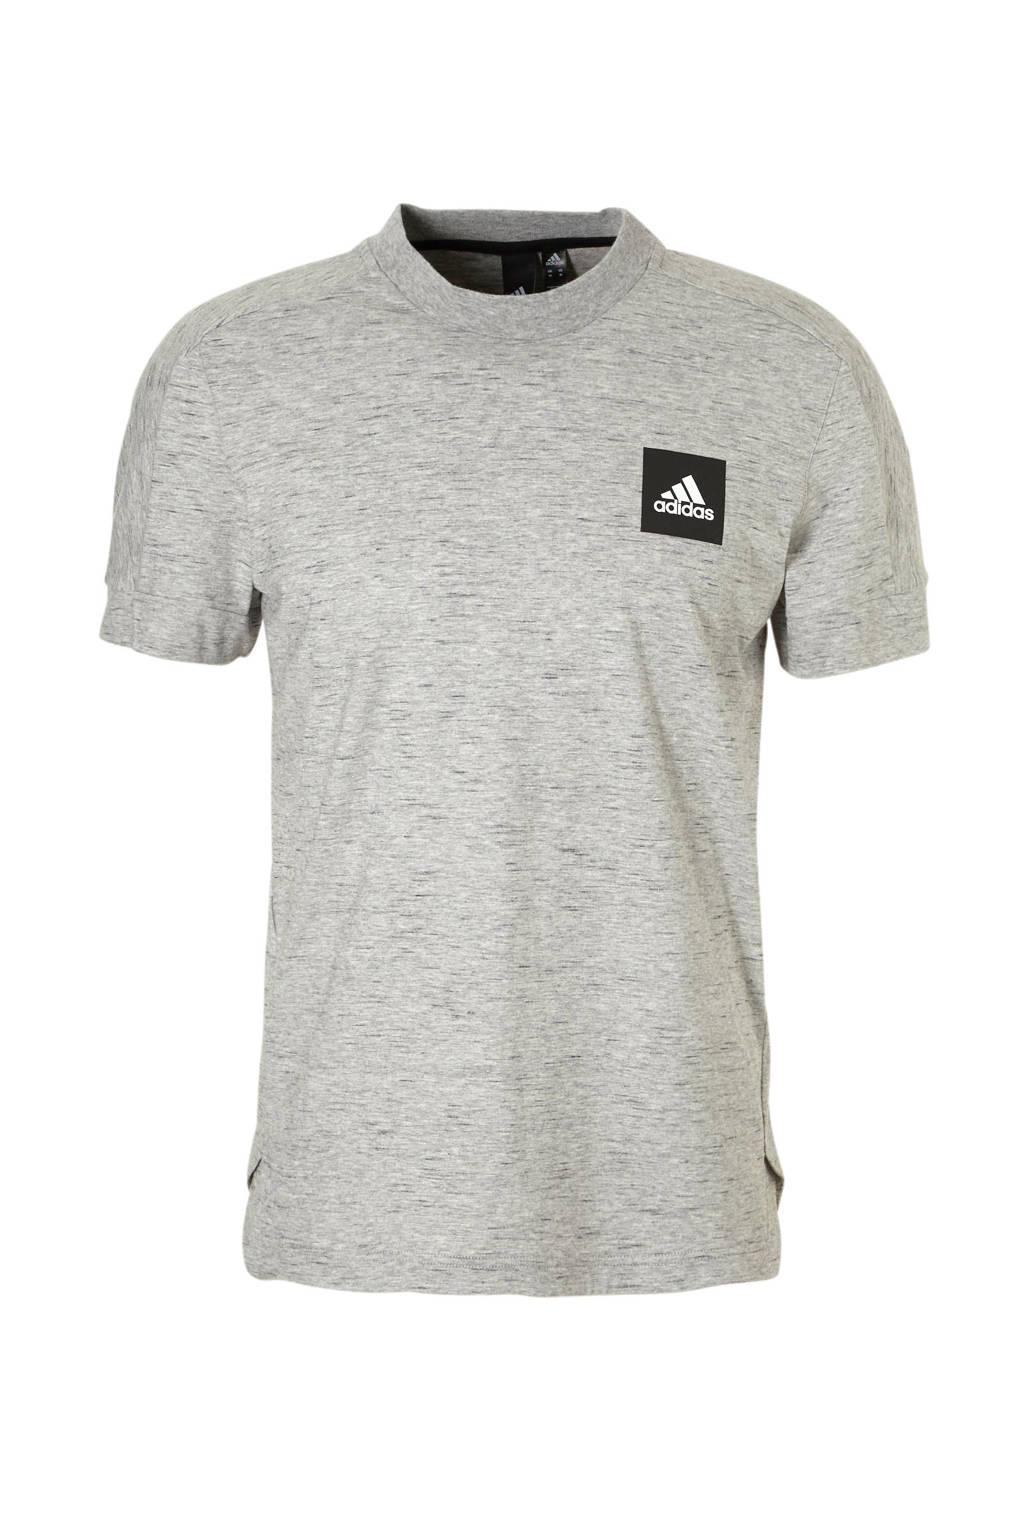 adidas performance   sport T-shirt, Grijs melange